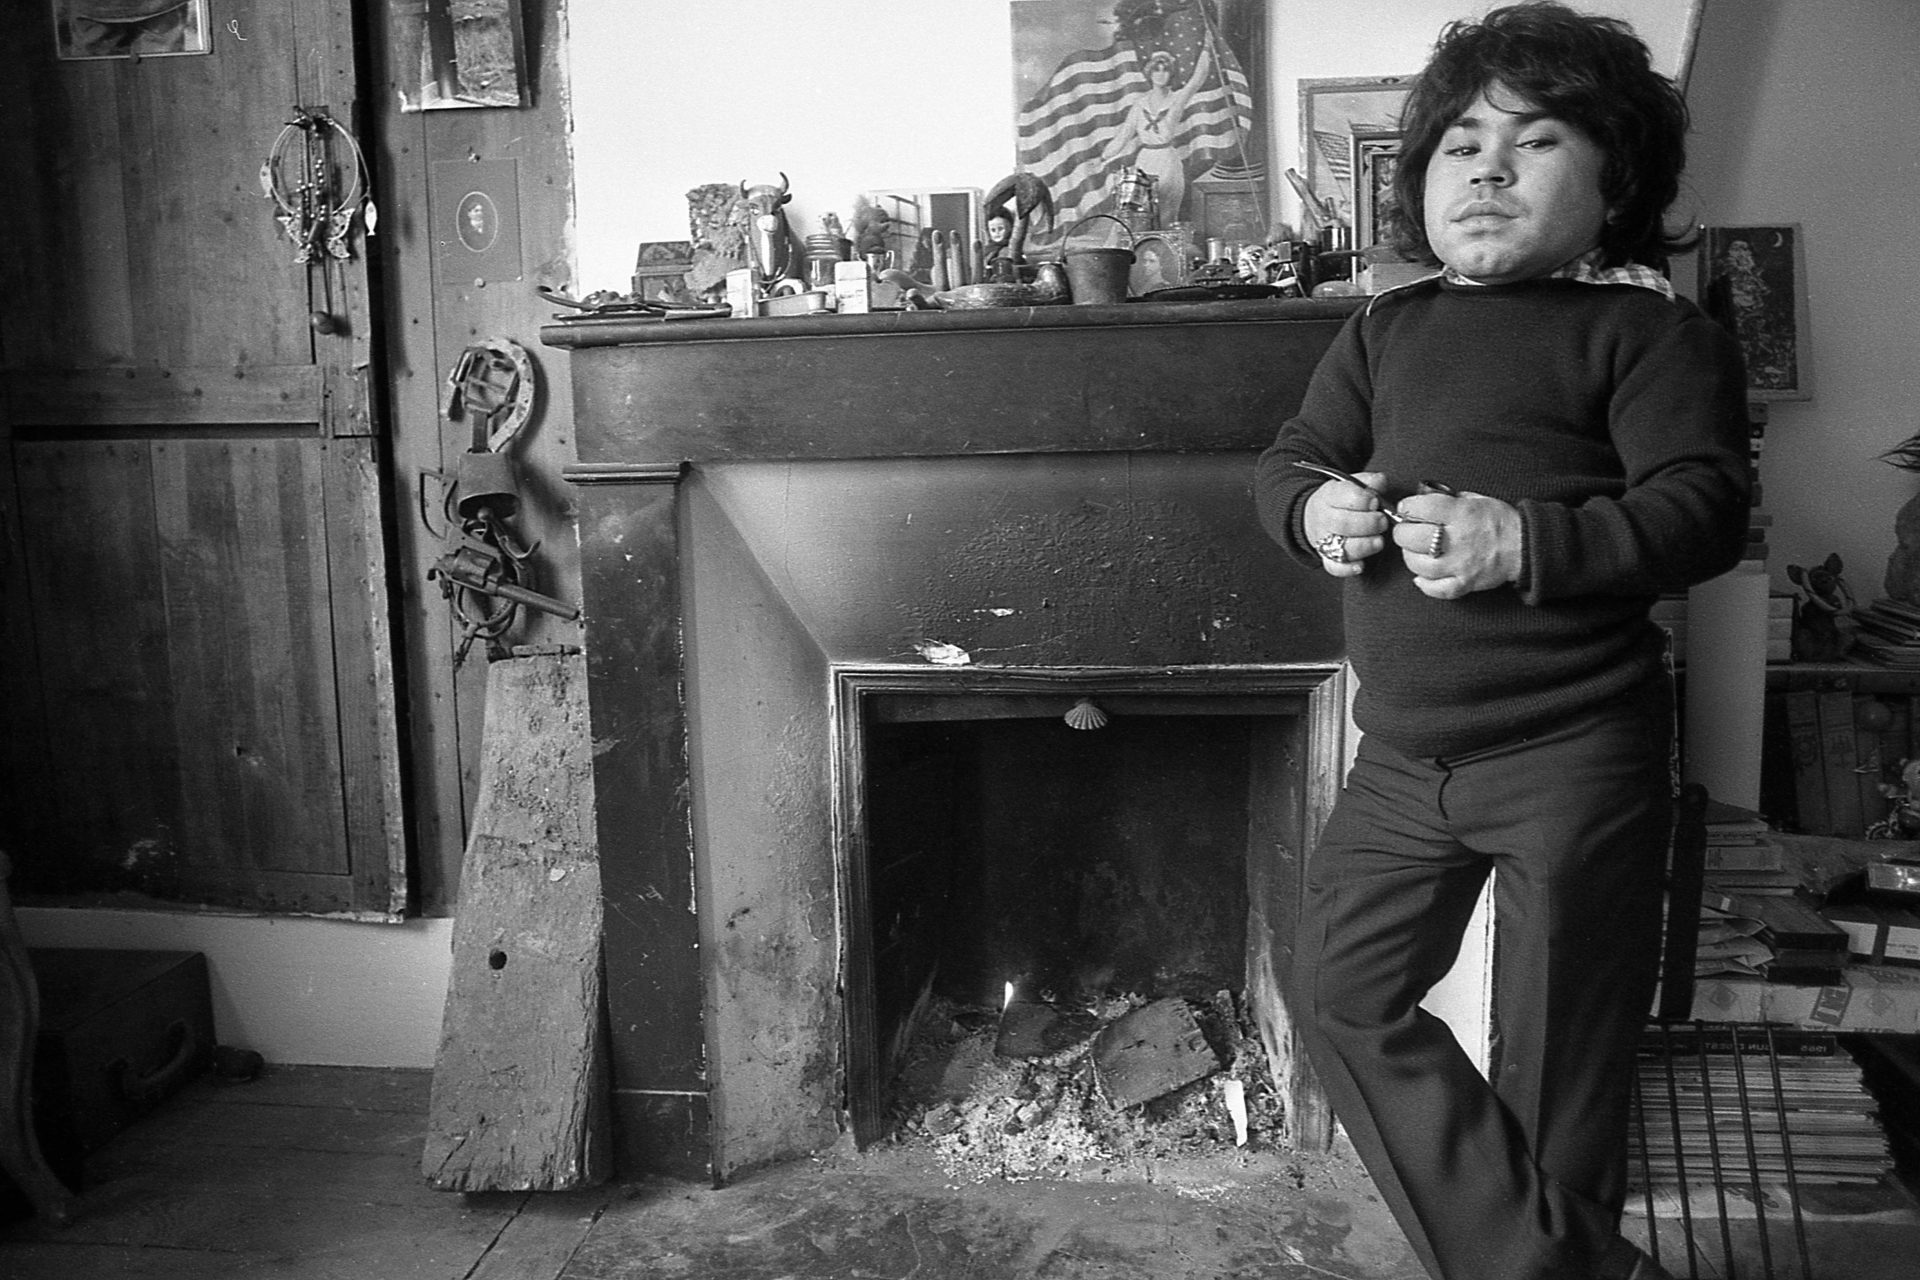 Herve Villechaize at home in his apartment in Paris; circa 1973. Credit: Nik Wheeler/ Corbis via Getty Images